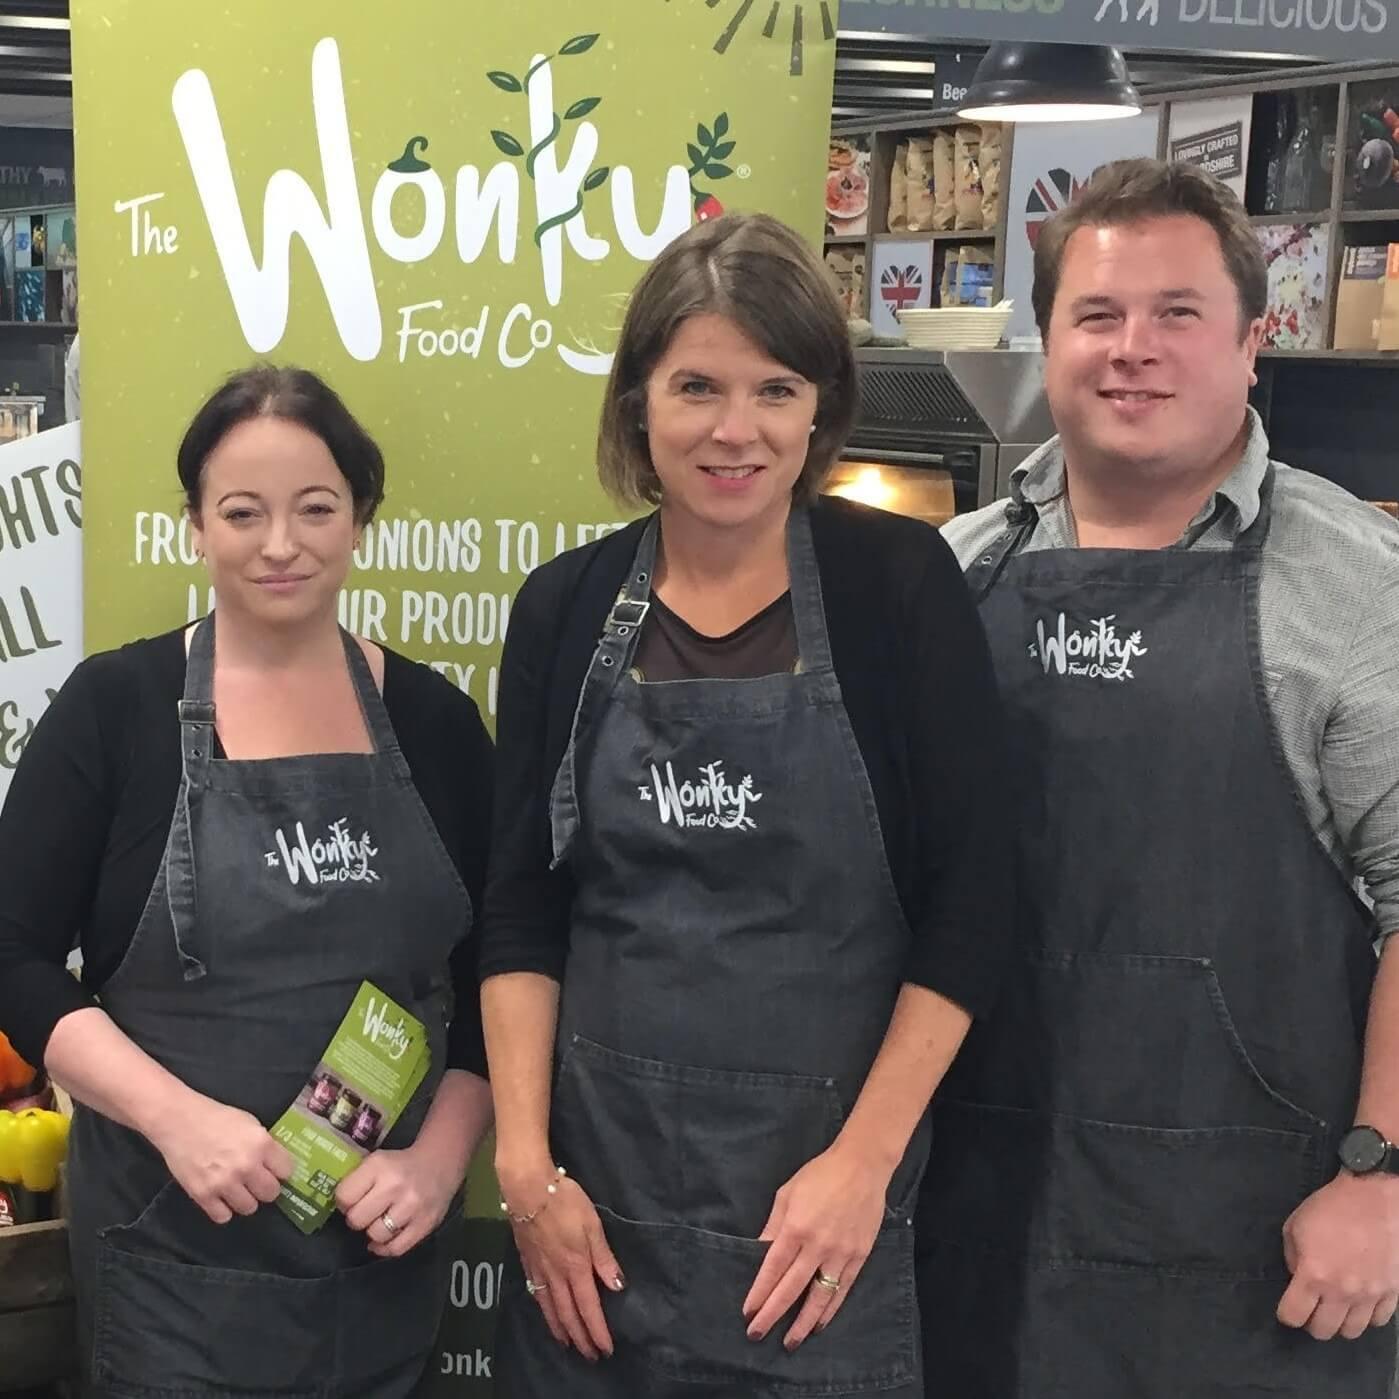 The Wonky Food Company